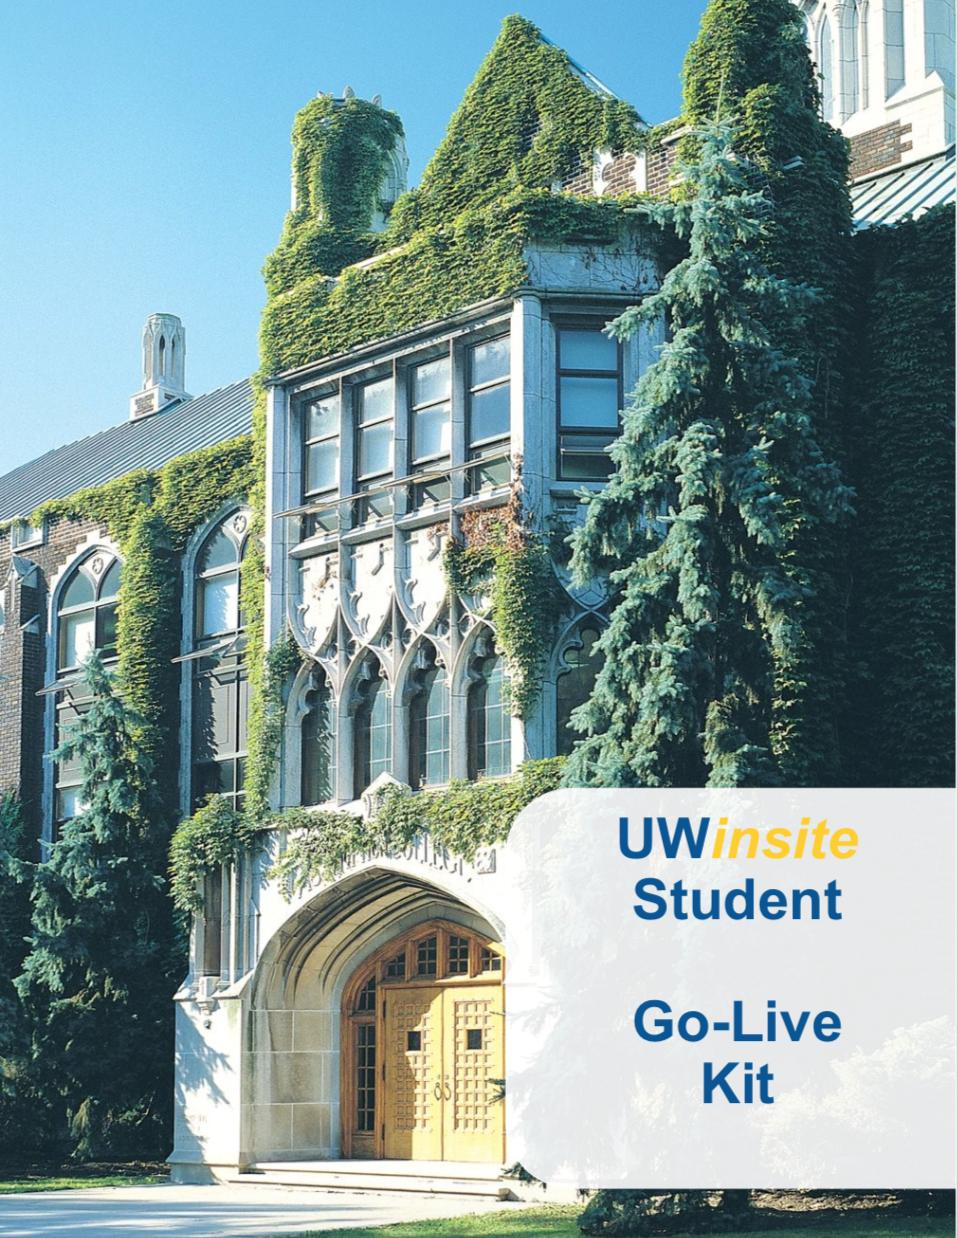 UWinsite Student - Basics